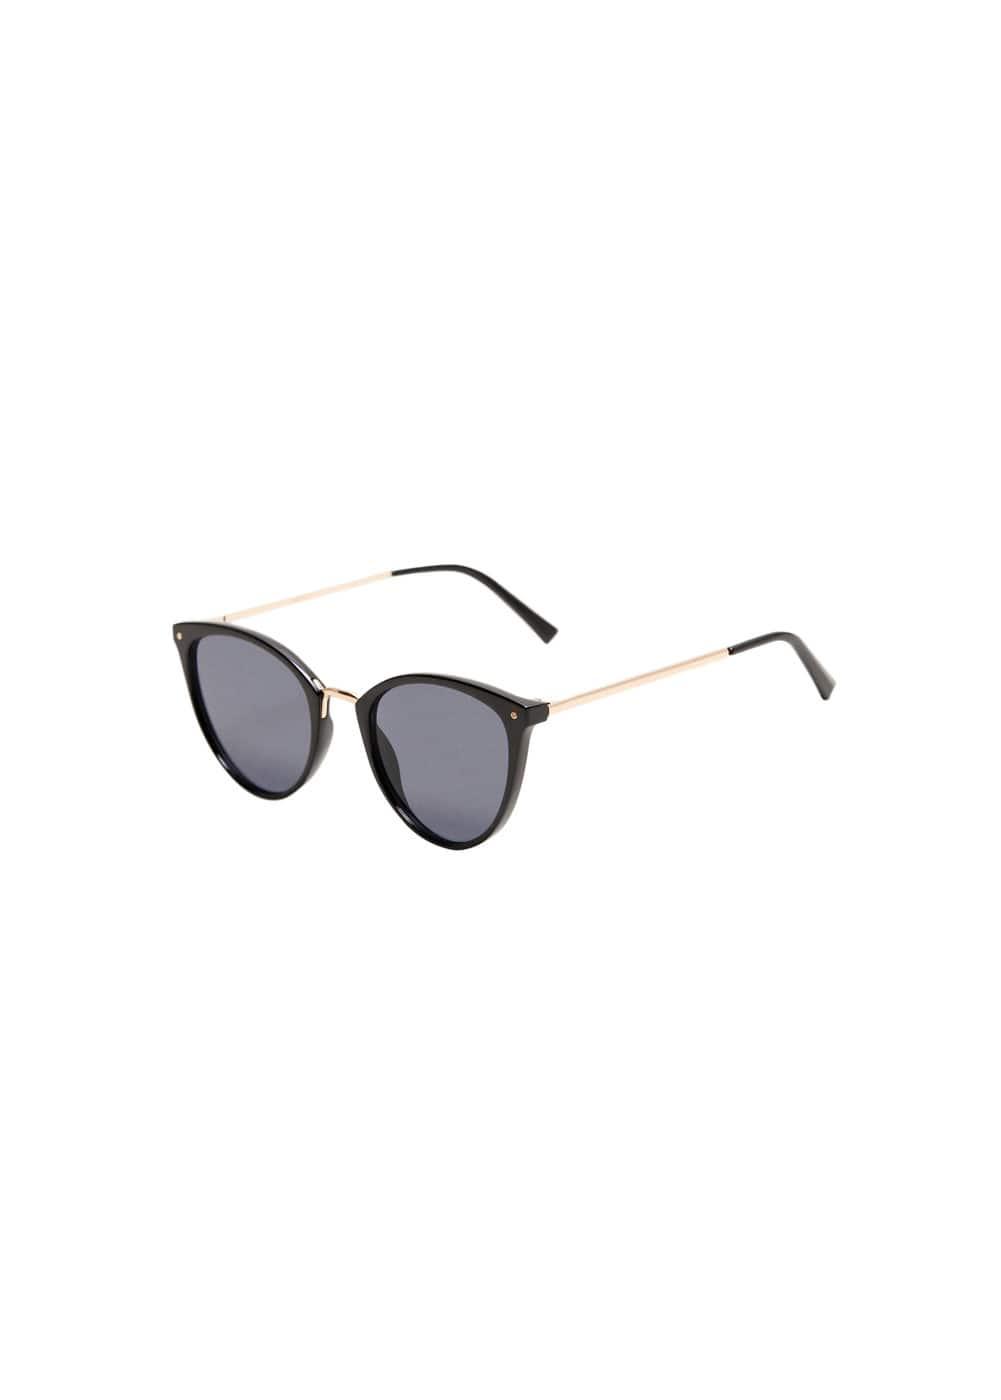 m-aqua5:gafas de sol combinadas